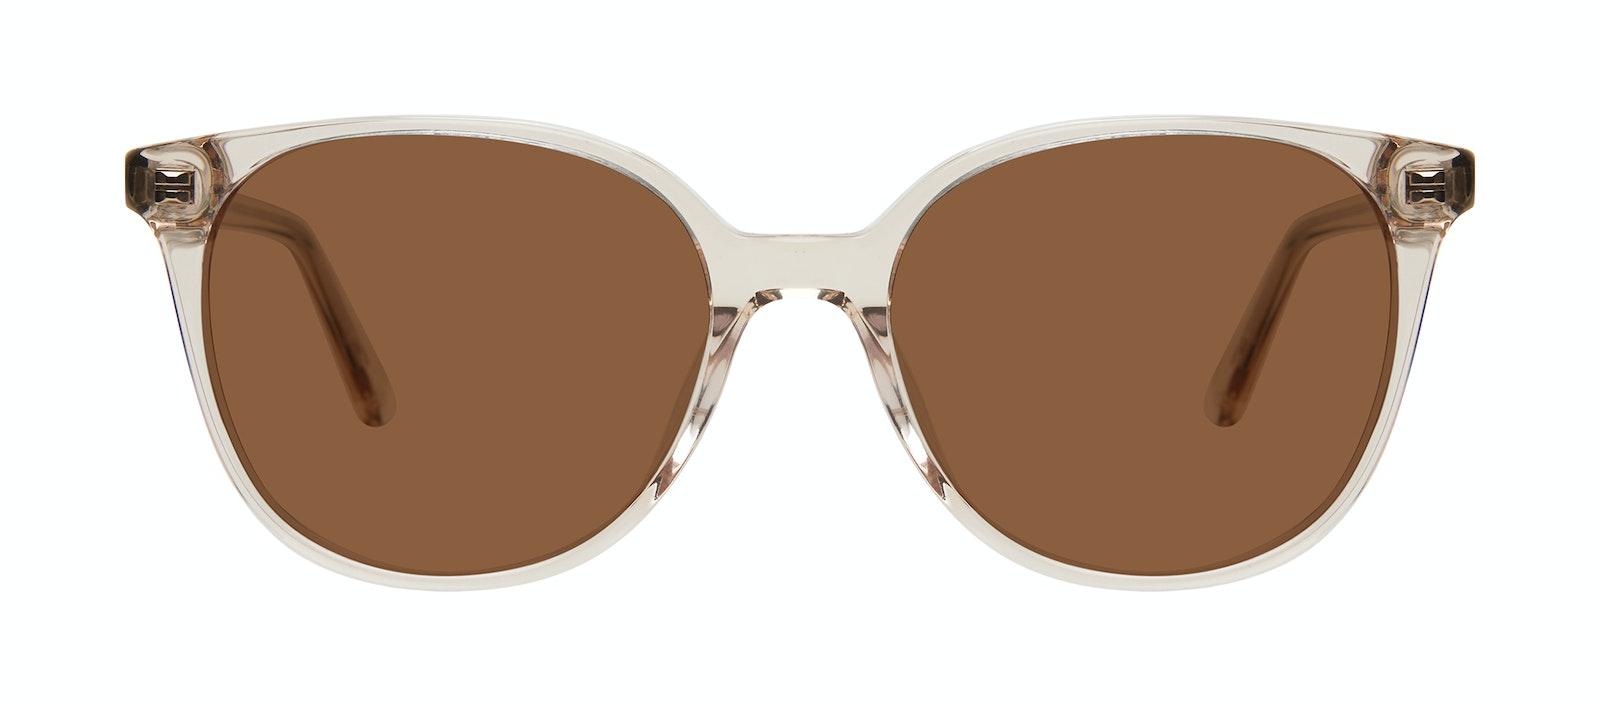 Affordable Fashion Glasses Square Sunglasses Women Novel Blond Front